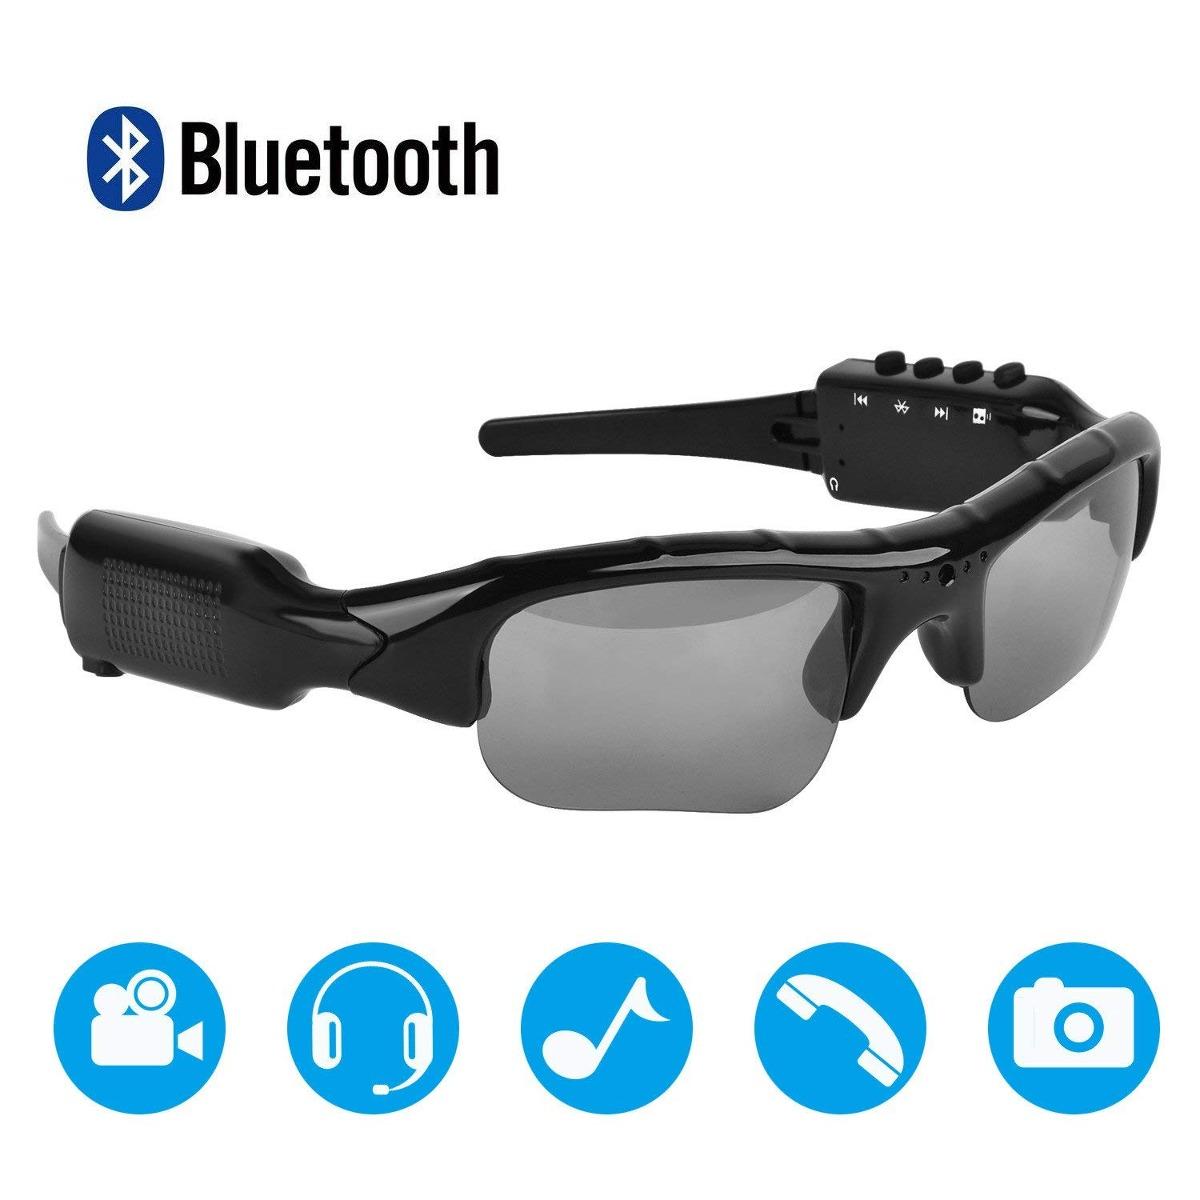 Sol So Gafas BluetoothMovteke Digital Cámara De lJu1cTFK3